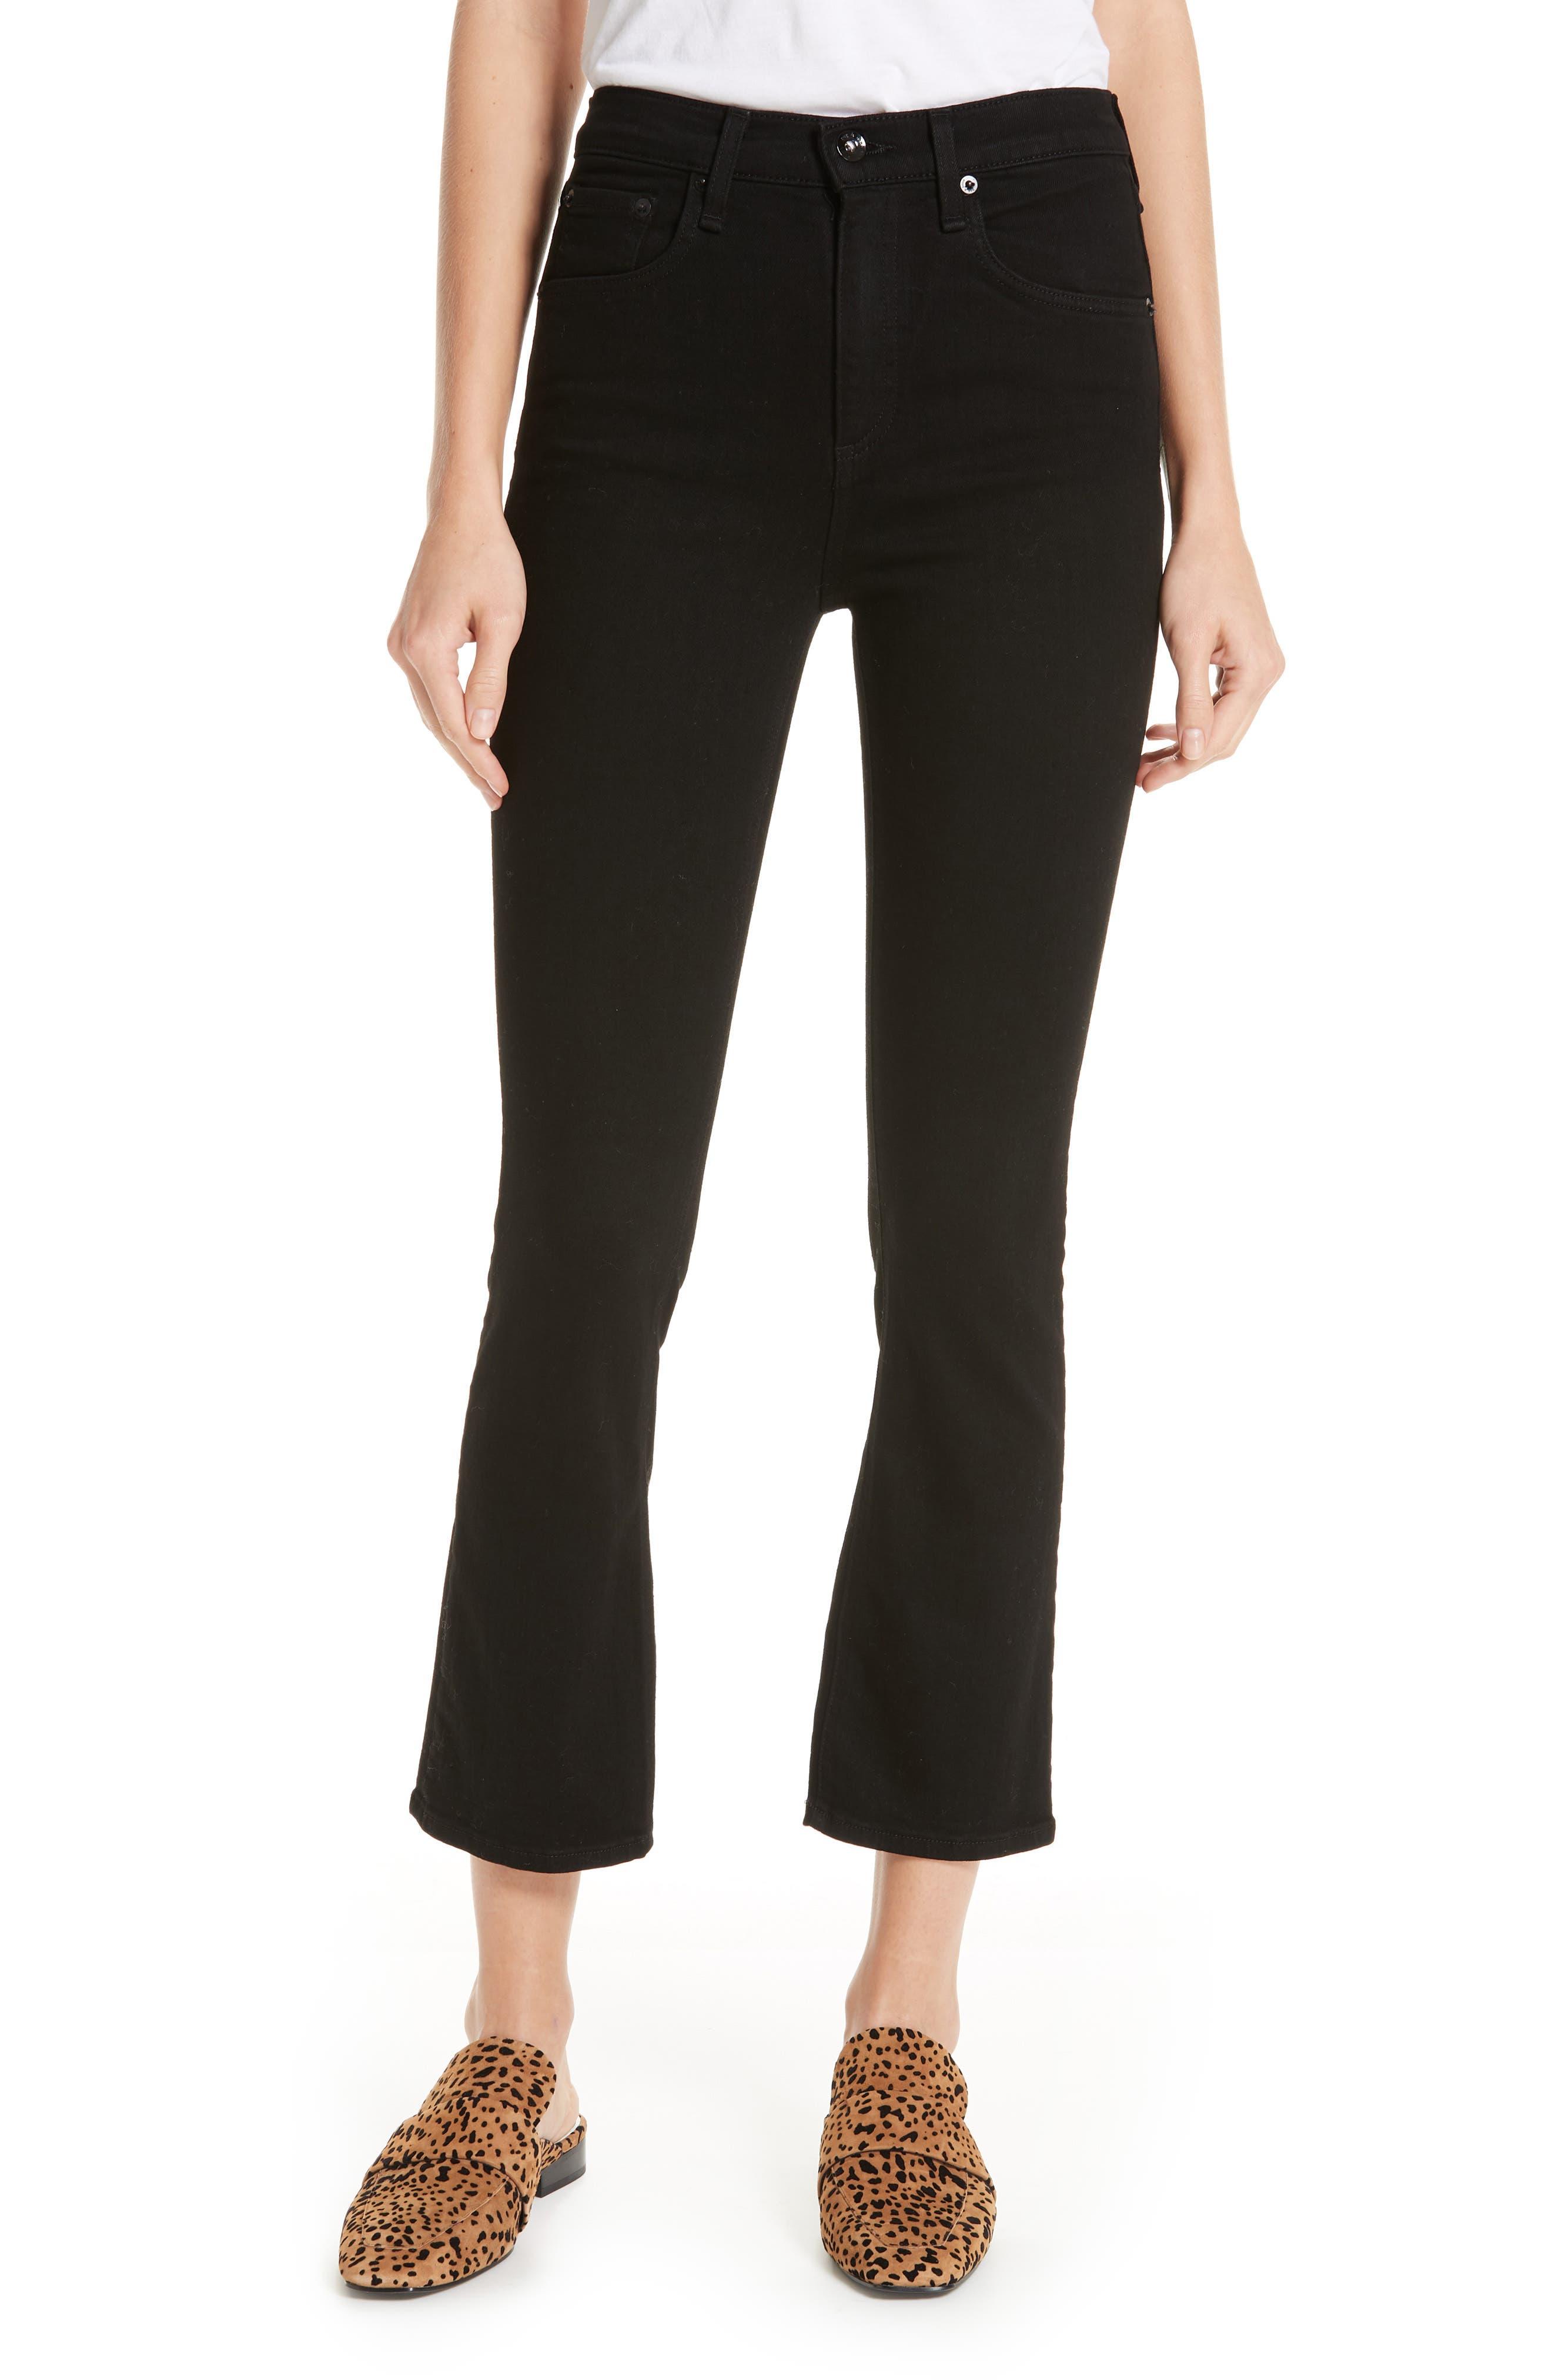 RAG & BONE Hana High Waist Ankle Flare Jeans, Main, color, 001